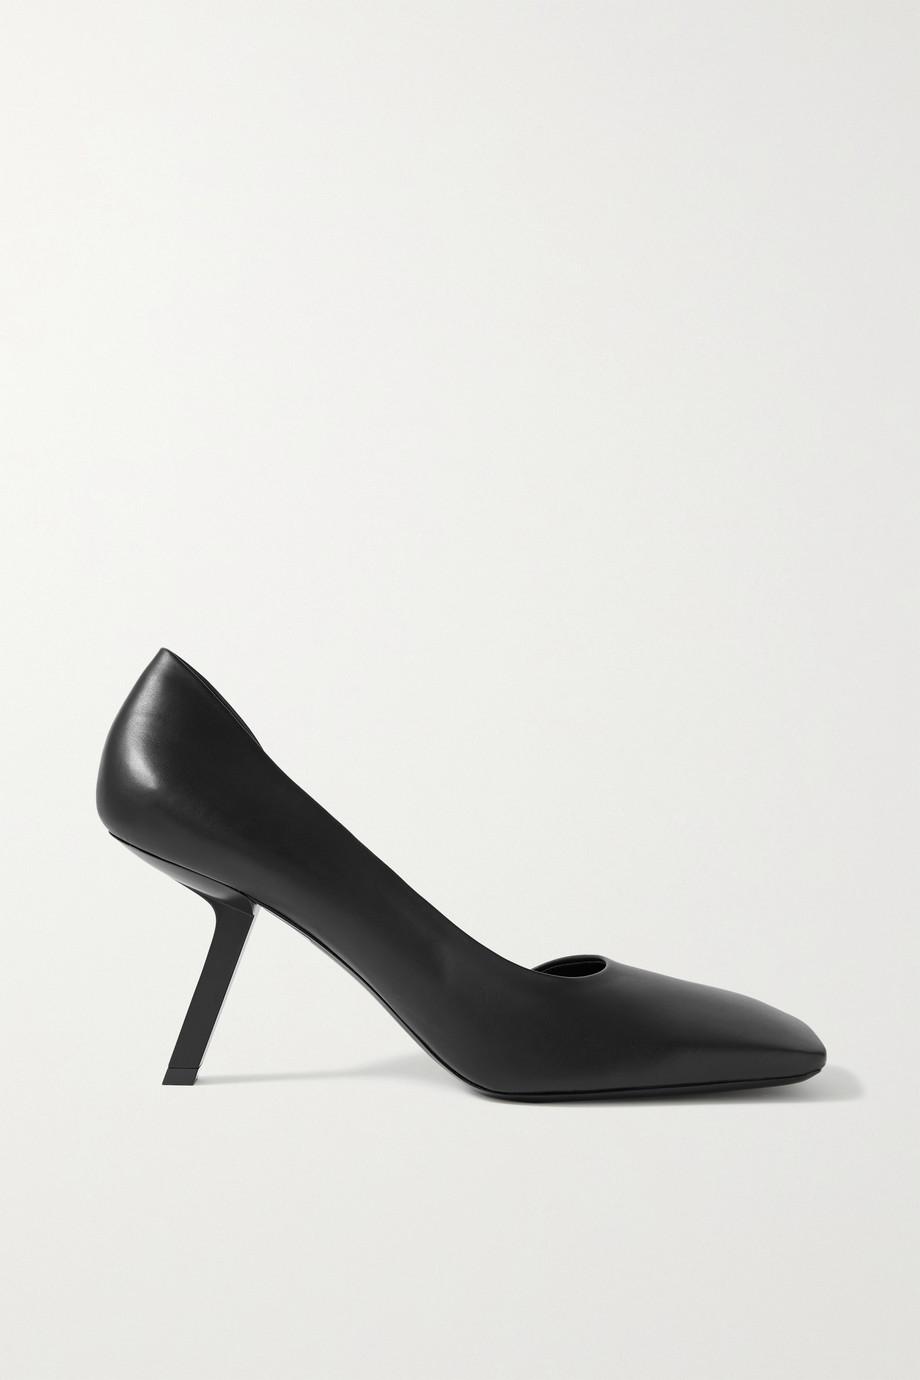 Balenciaga Void leather pumps